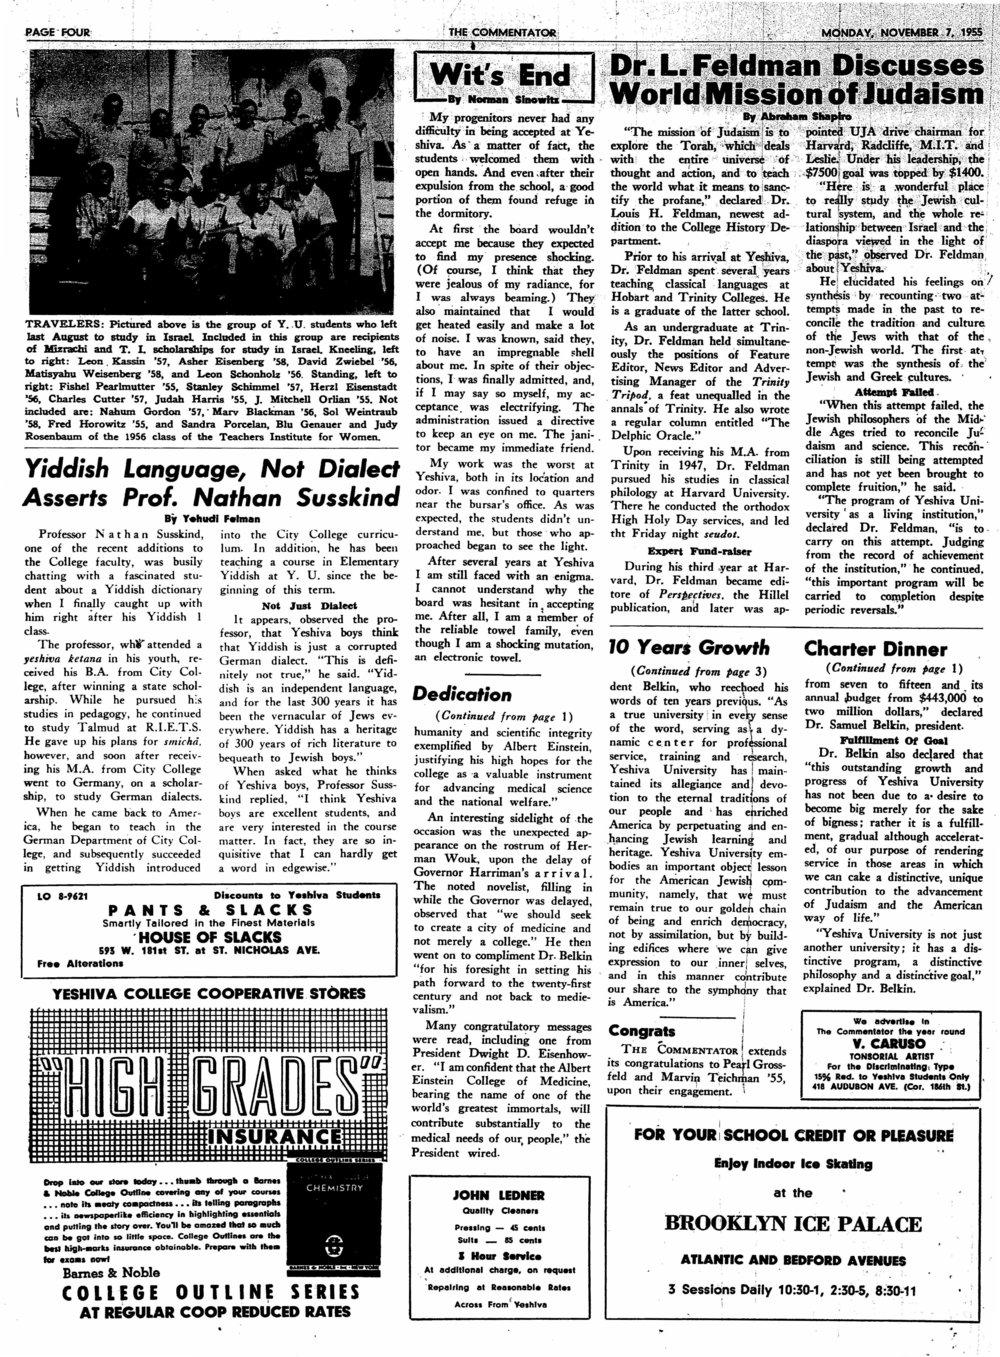 1955.11.7.TC--Dr. L. Feldman Discusses World Mission of Judaism.jpg